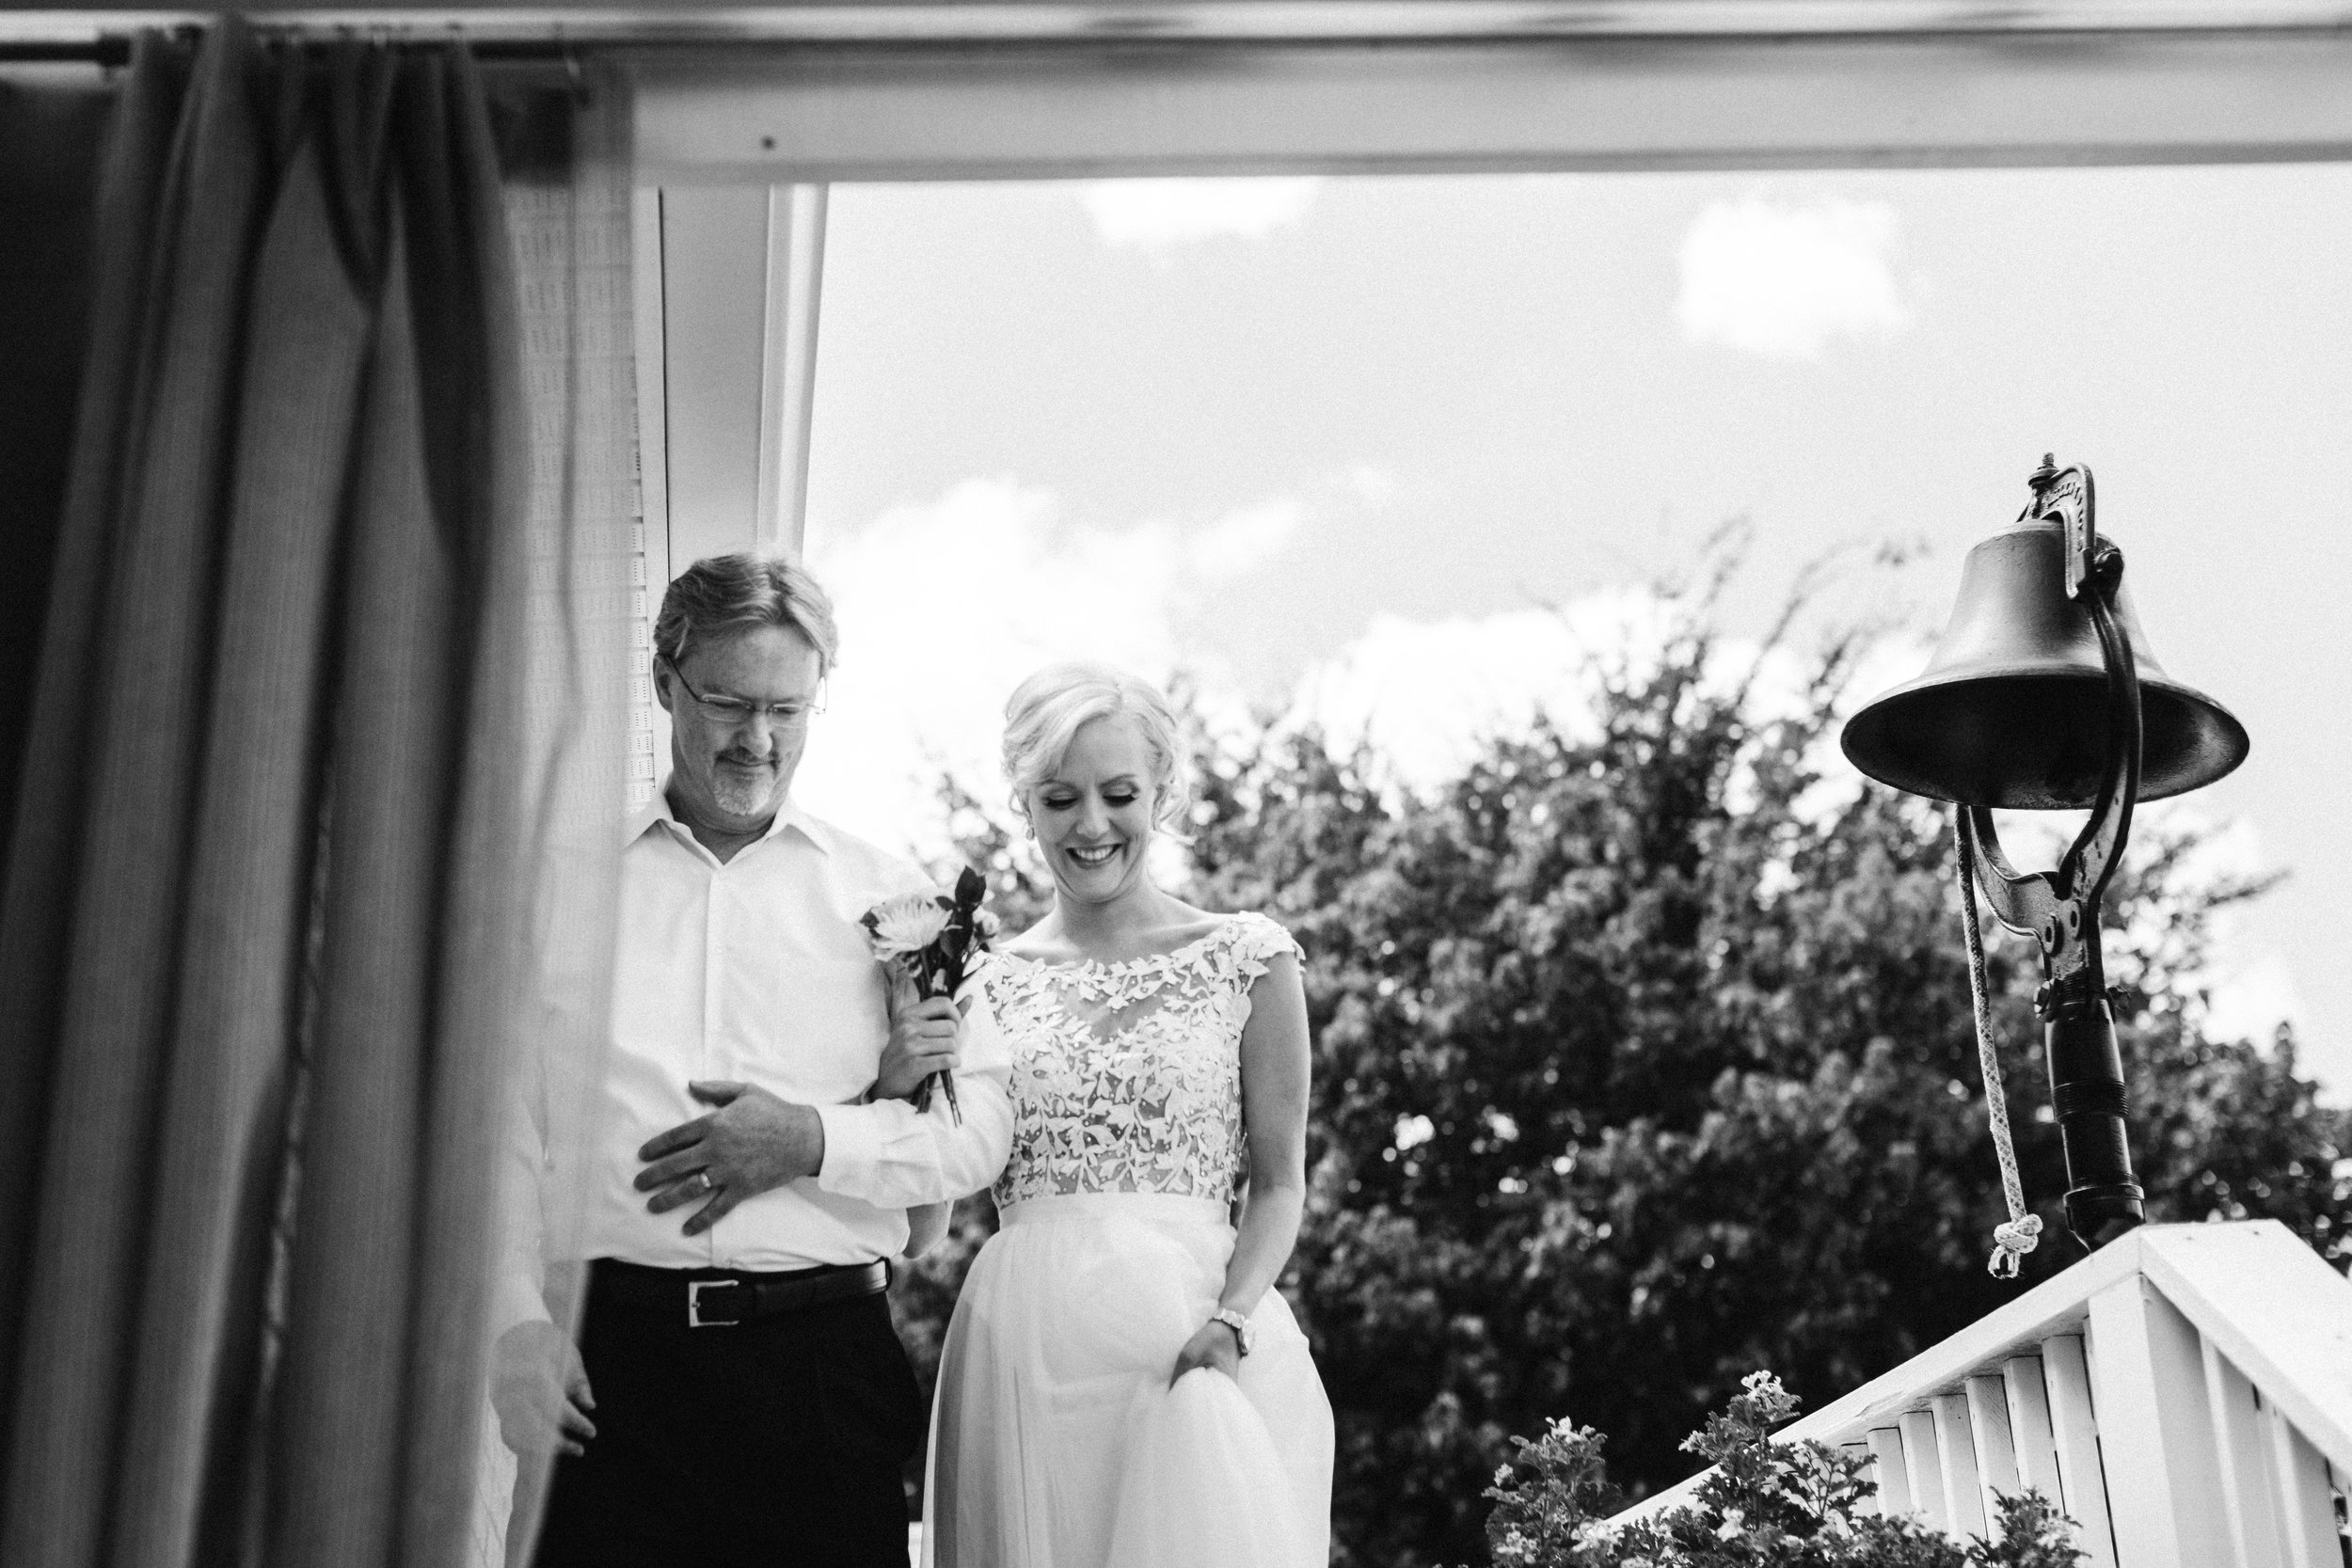 2018.09.02 Ray and Sarah Prizner Nashville TN Wedding FINALS-227.jpg